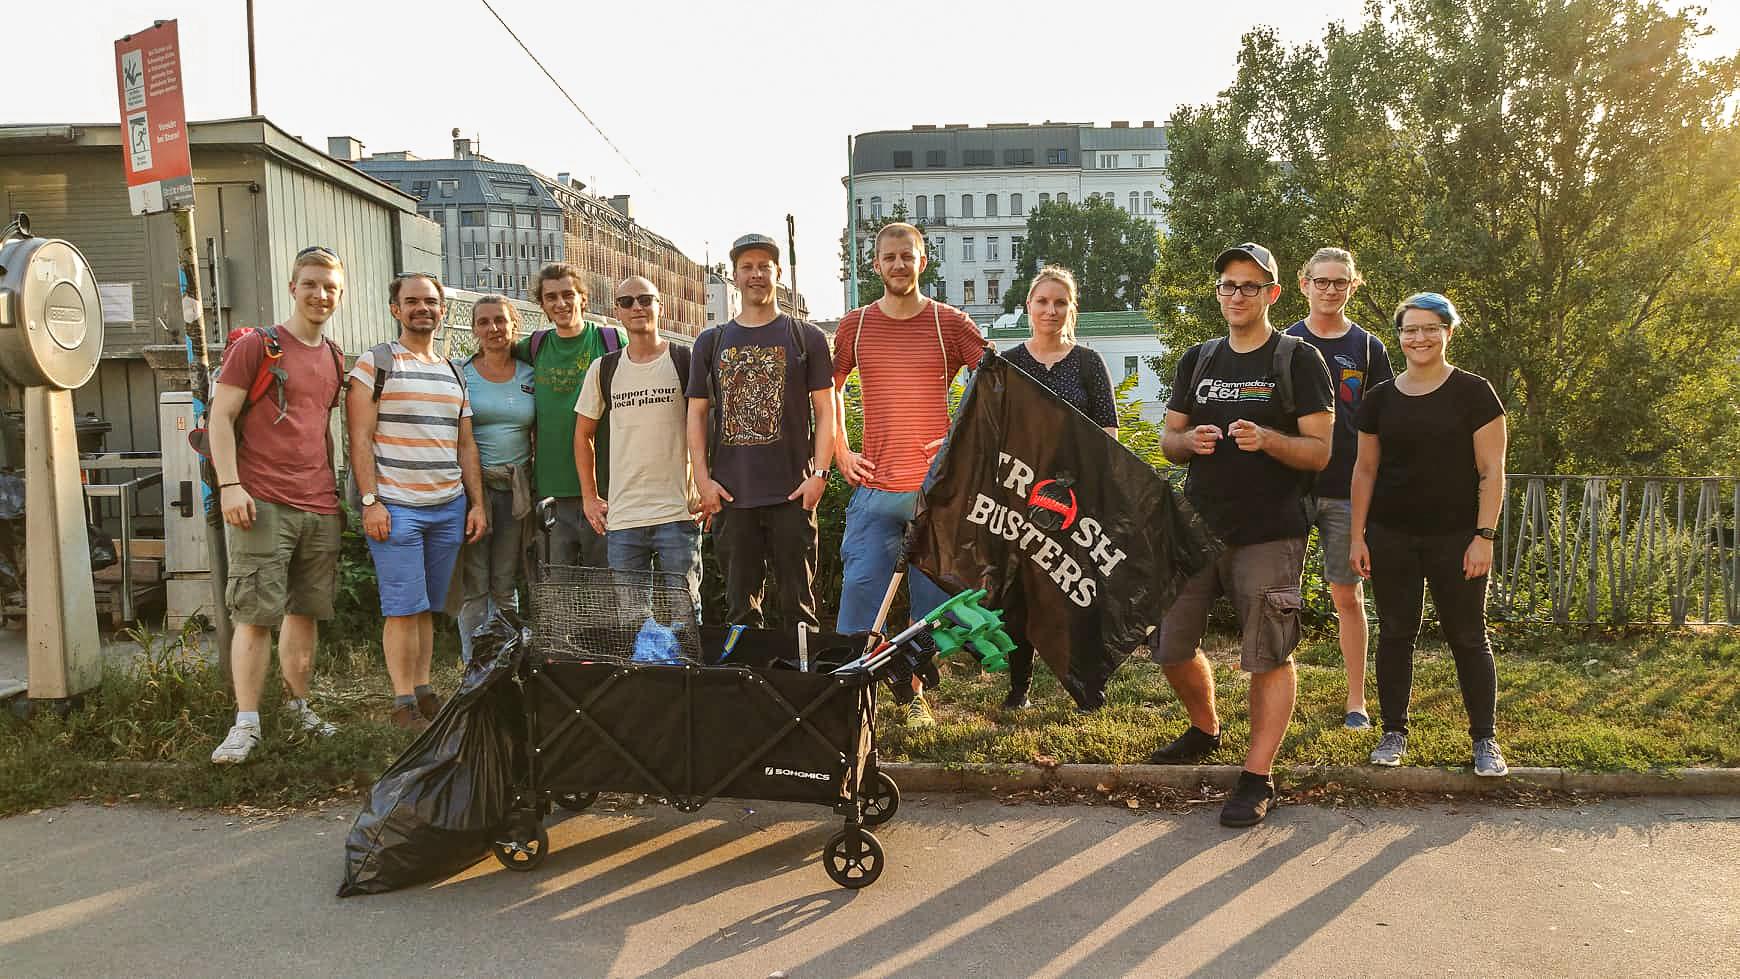 Trashbusters Donaukanal